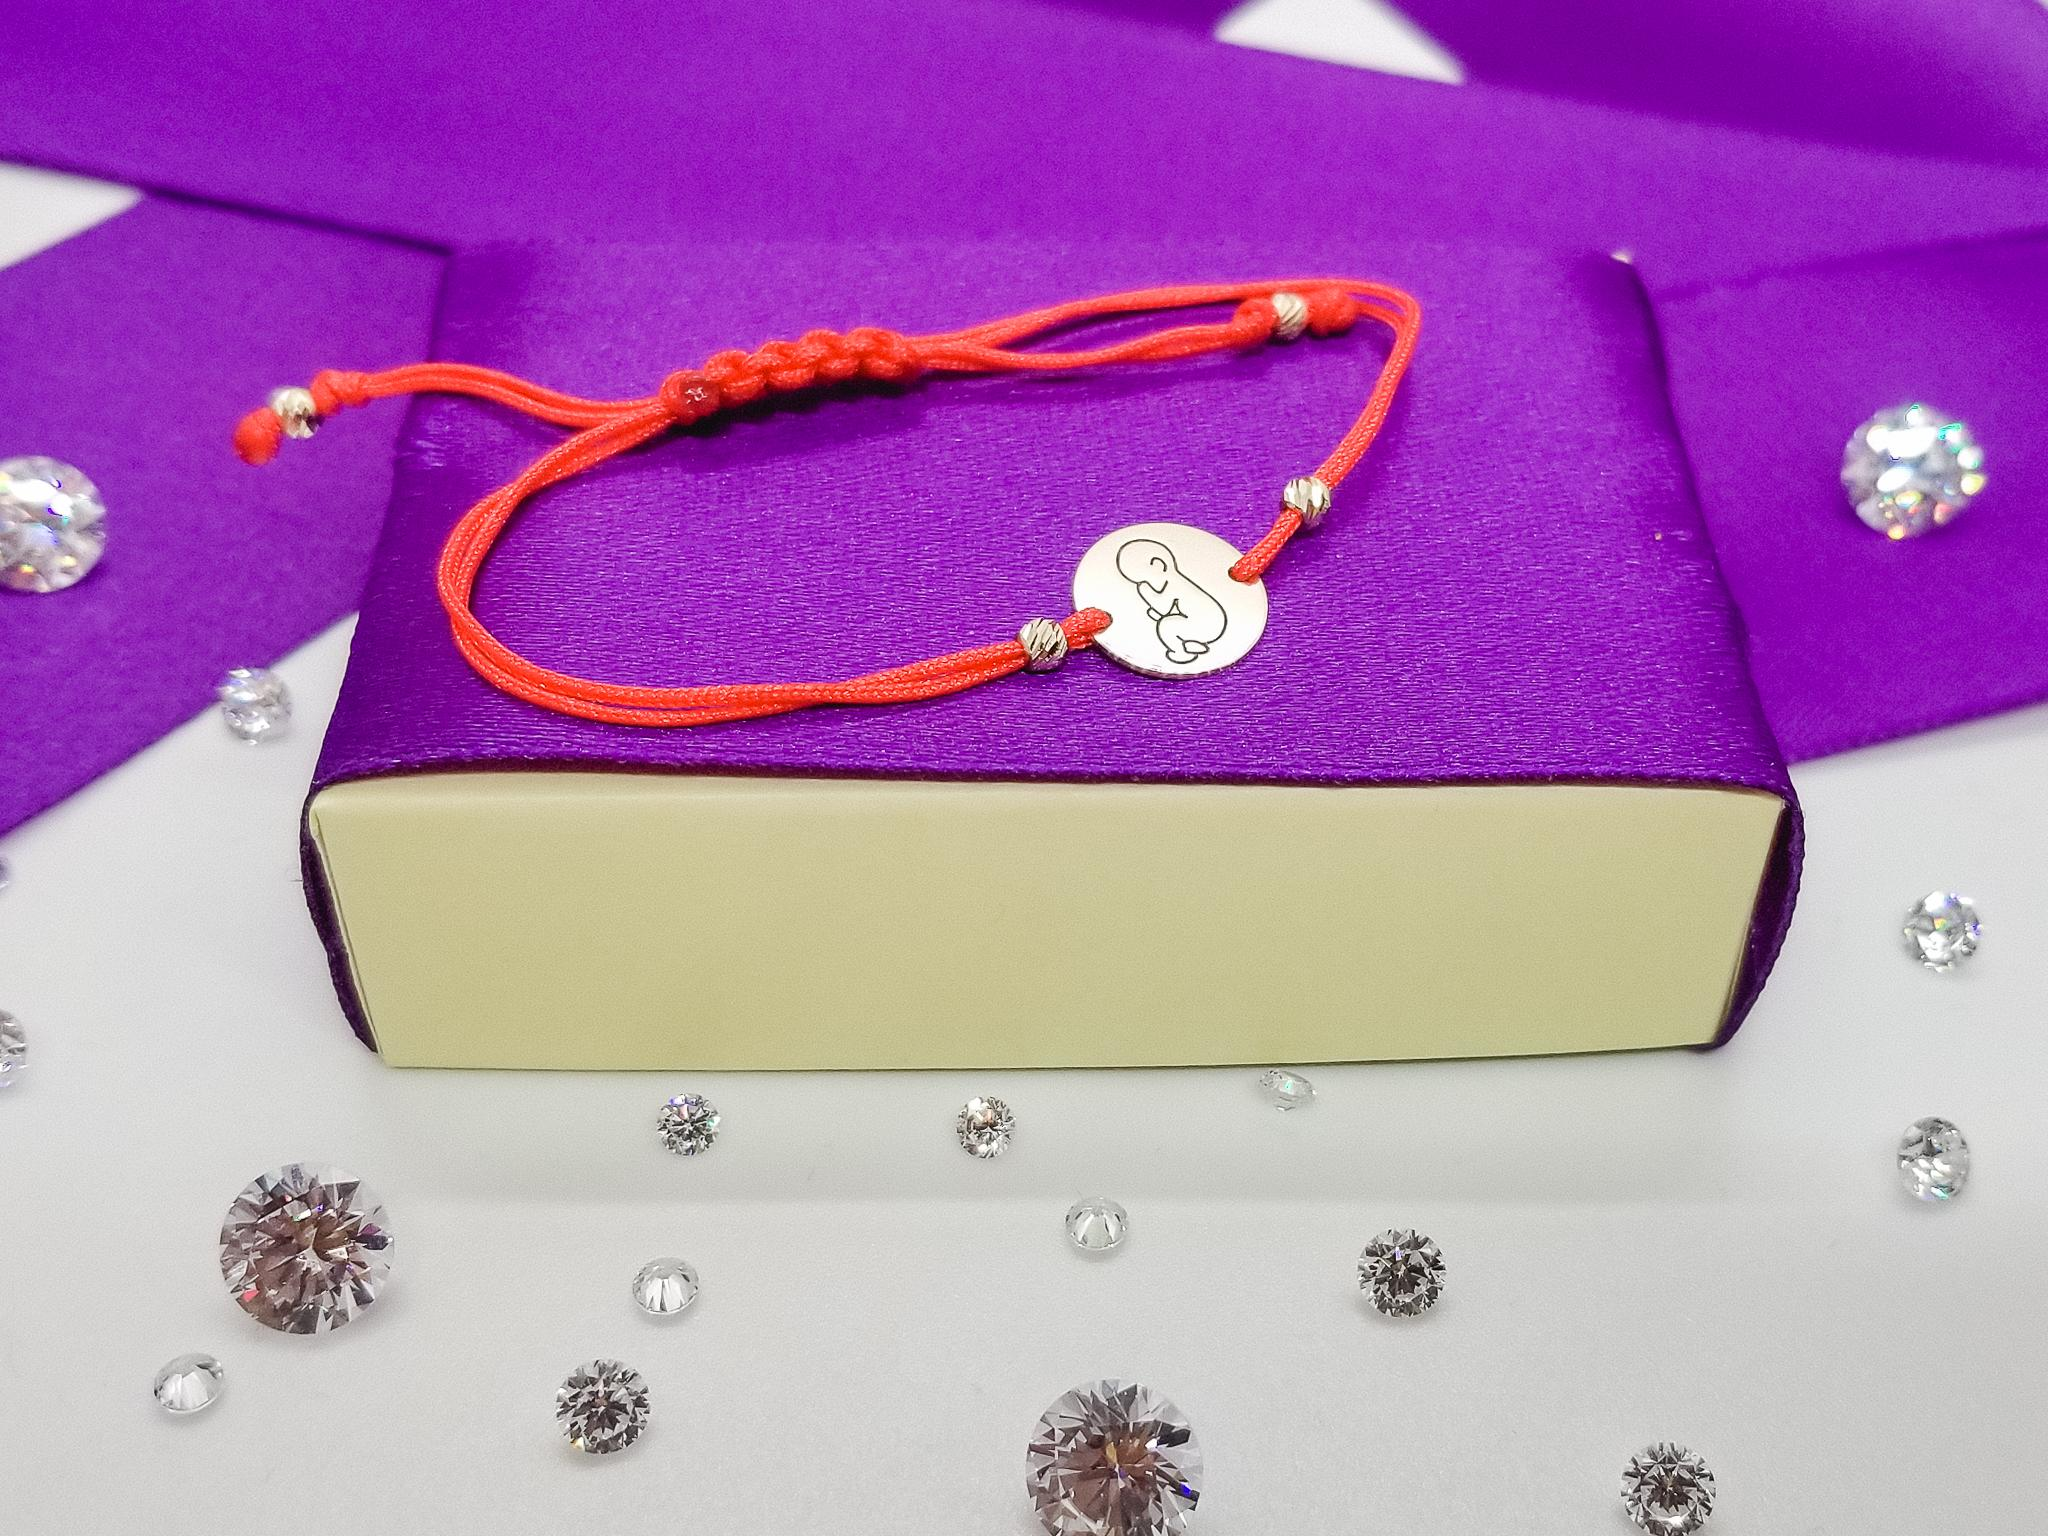 Bratara FATI 210 Banut cu Bebelus din aur galben de 14K cu snur rosu.